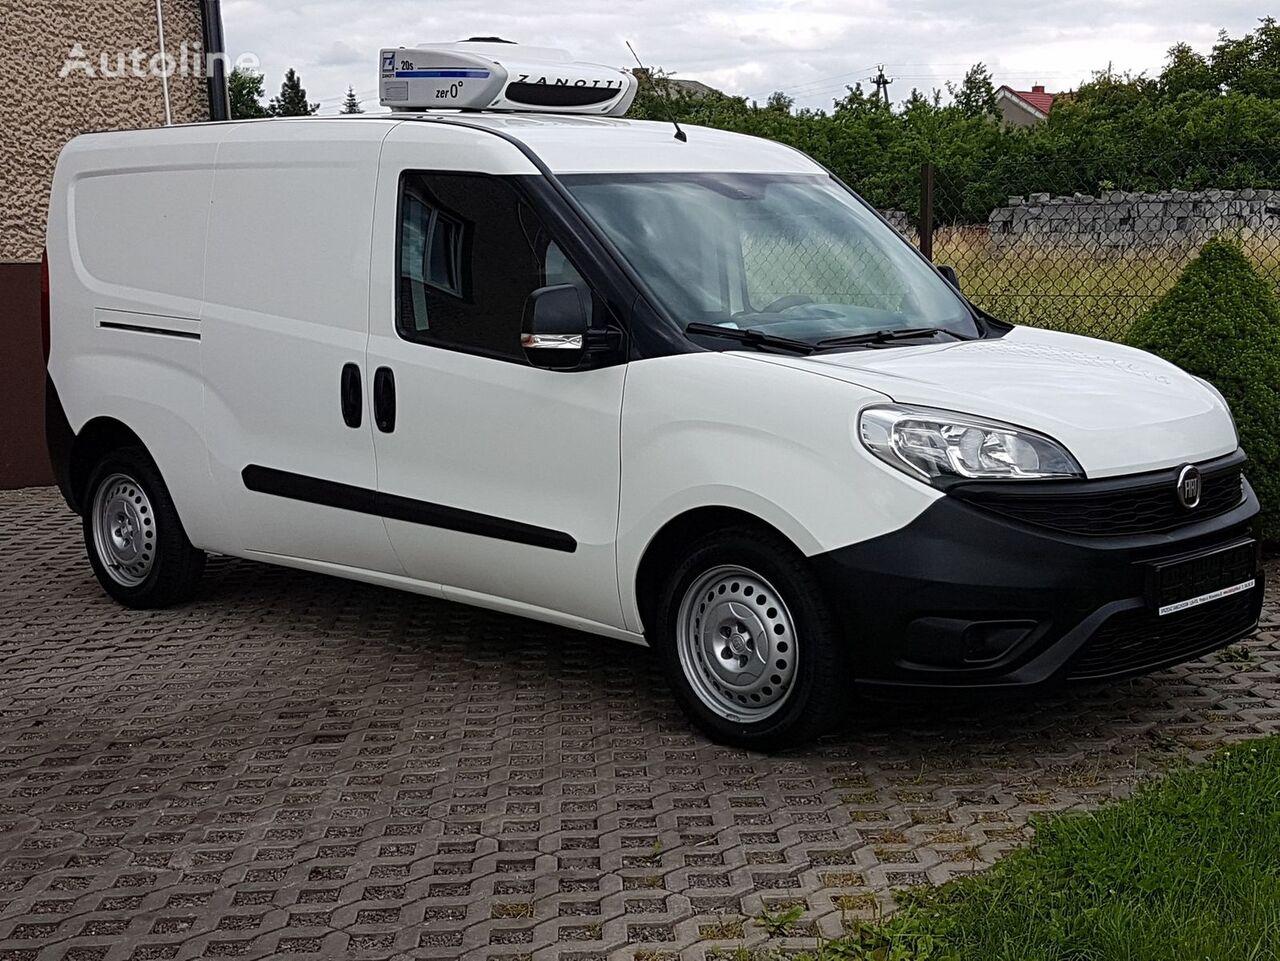 FIAT DOBLO MAXI CHŁODNIA MROŹNIA + GRZANIE IZOTERMA DŁUGI AC refrigerated van